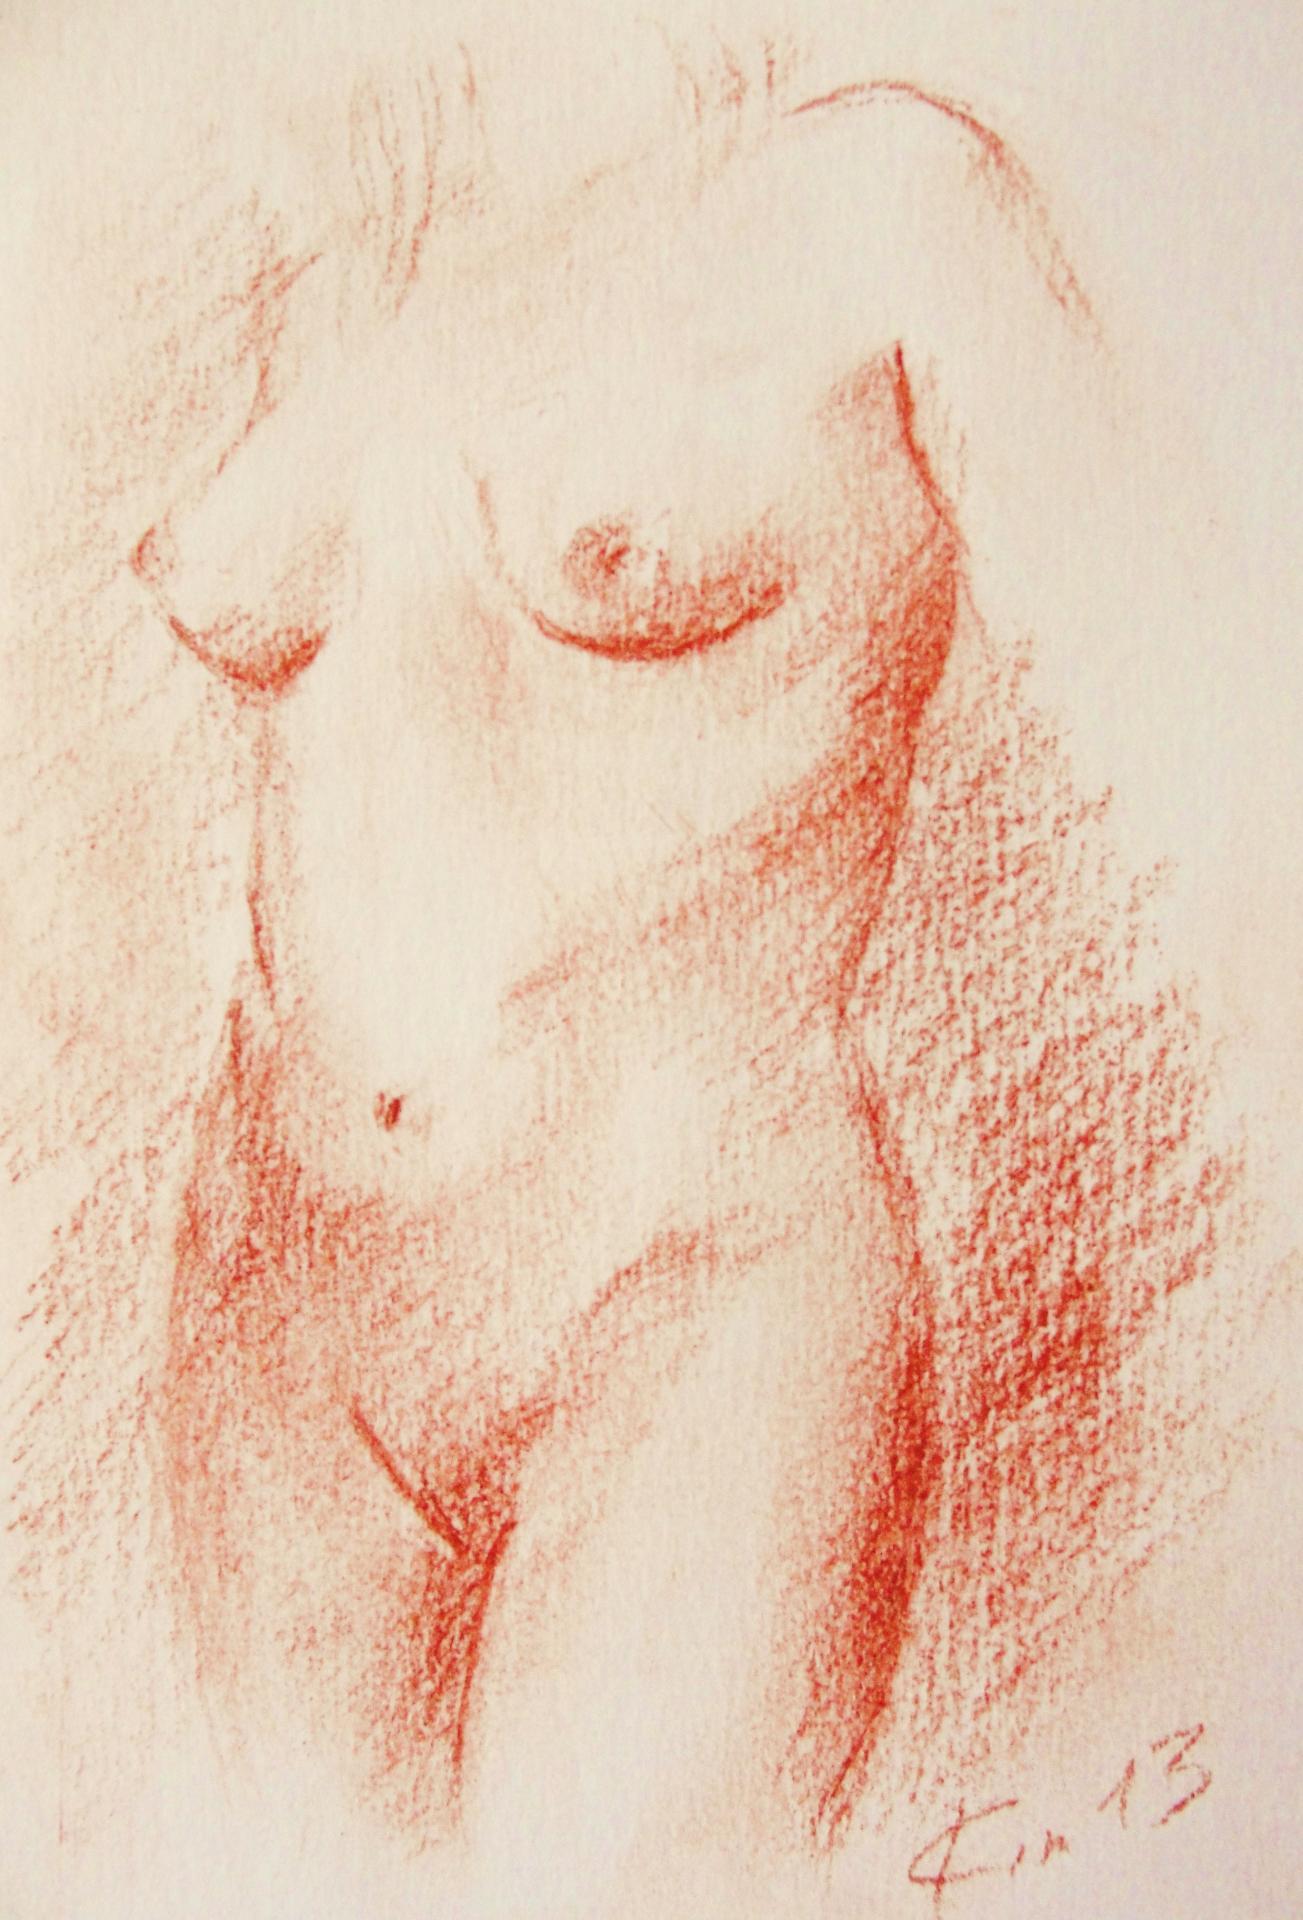 Nu artistique sanguine de jean joseph chevalier 6